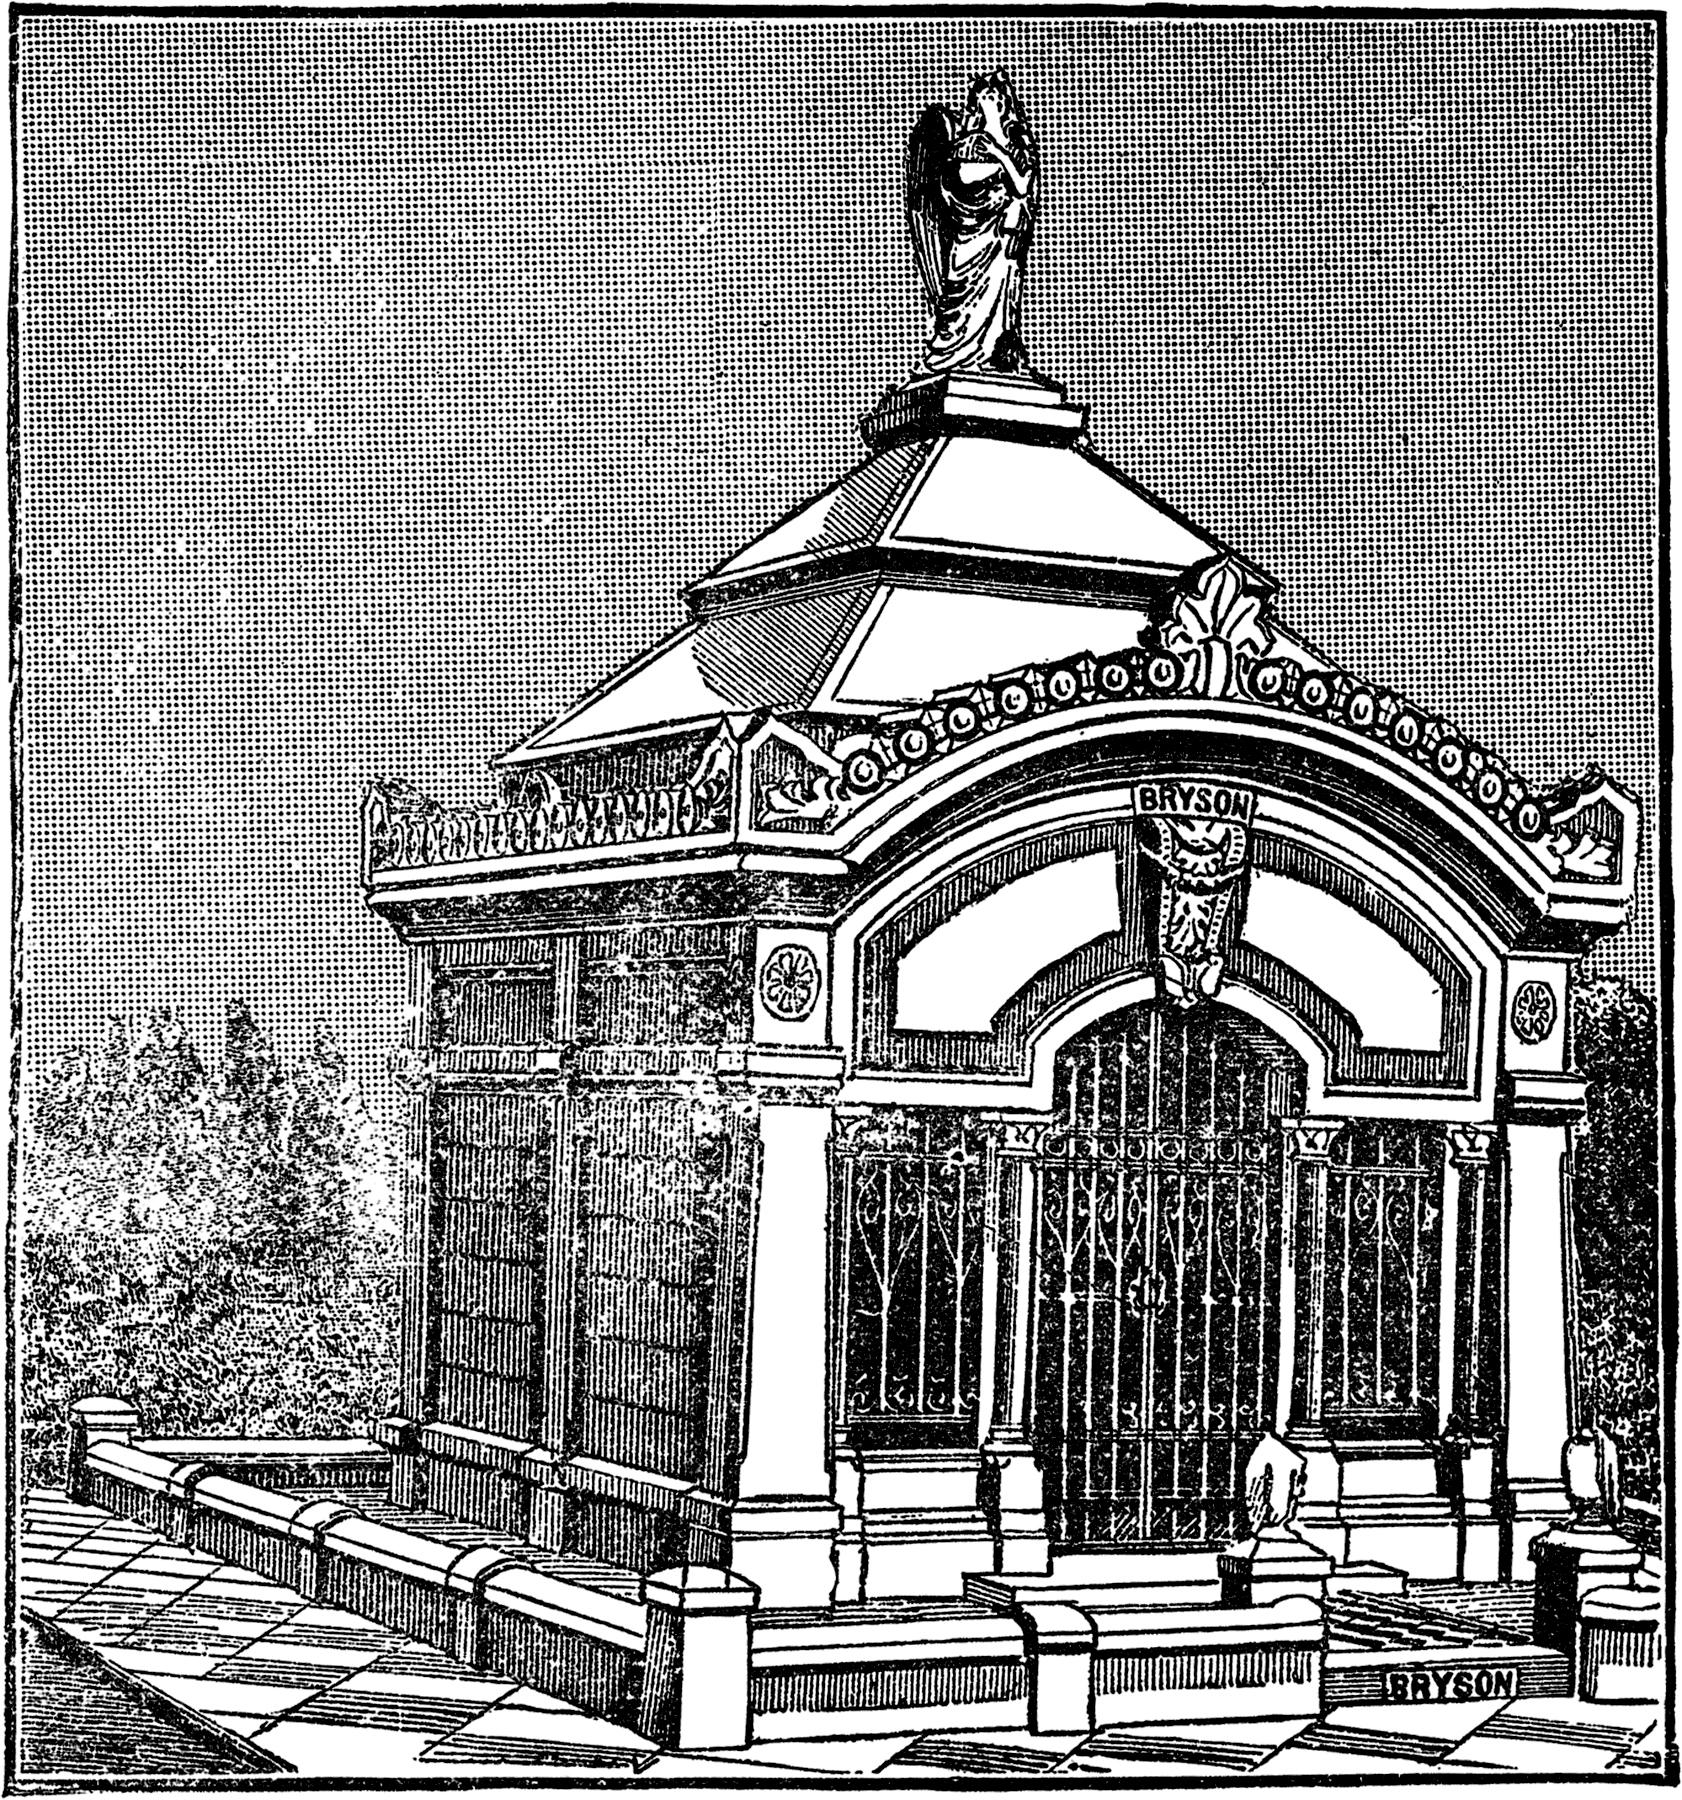 Vintage Mausoleum Image.